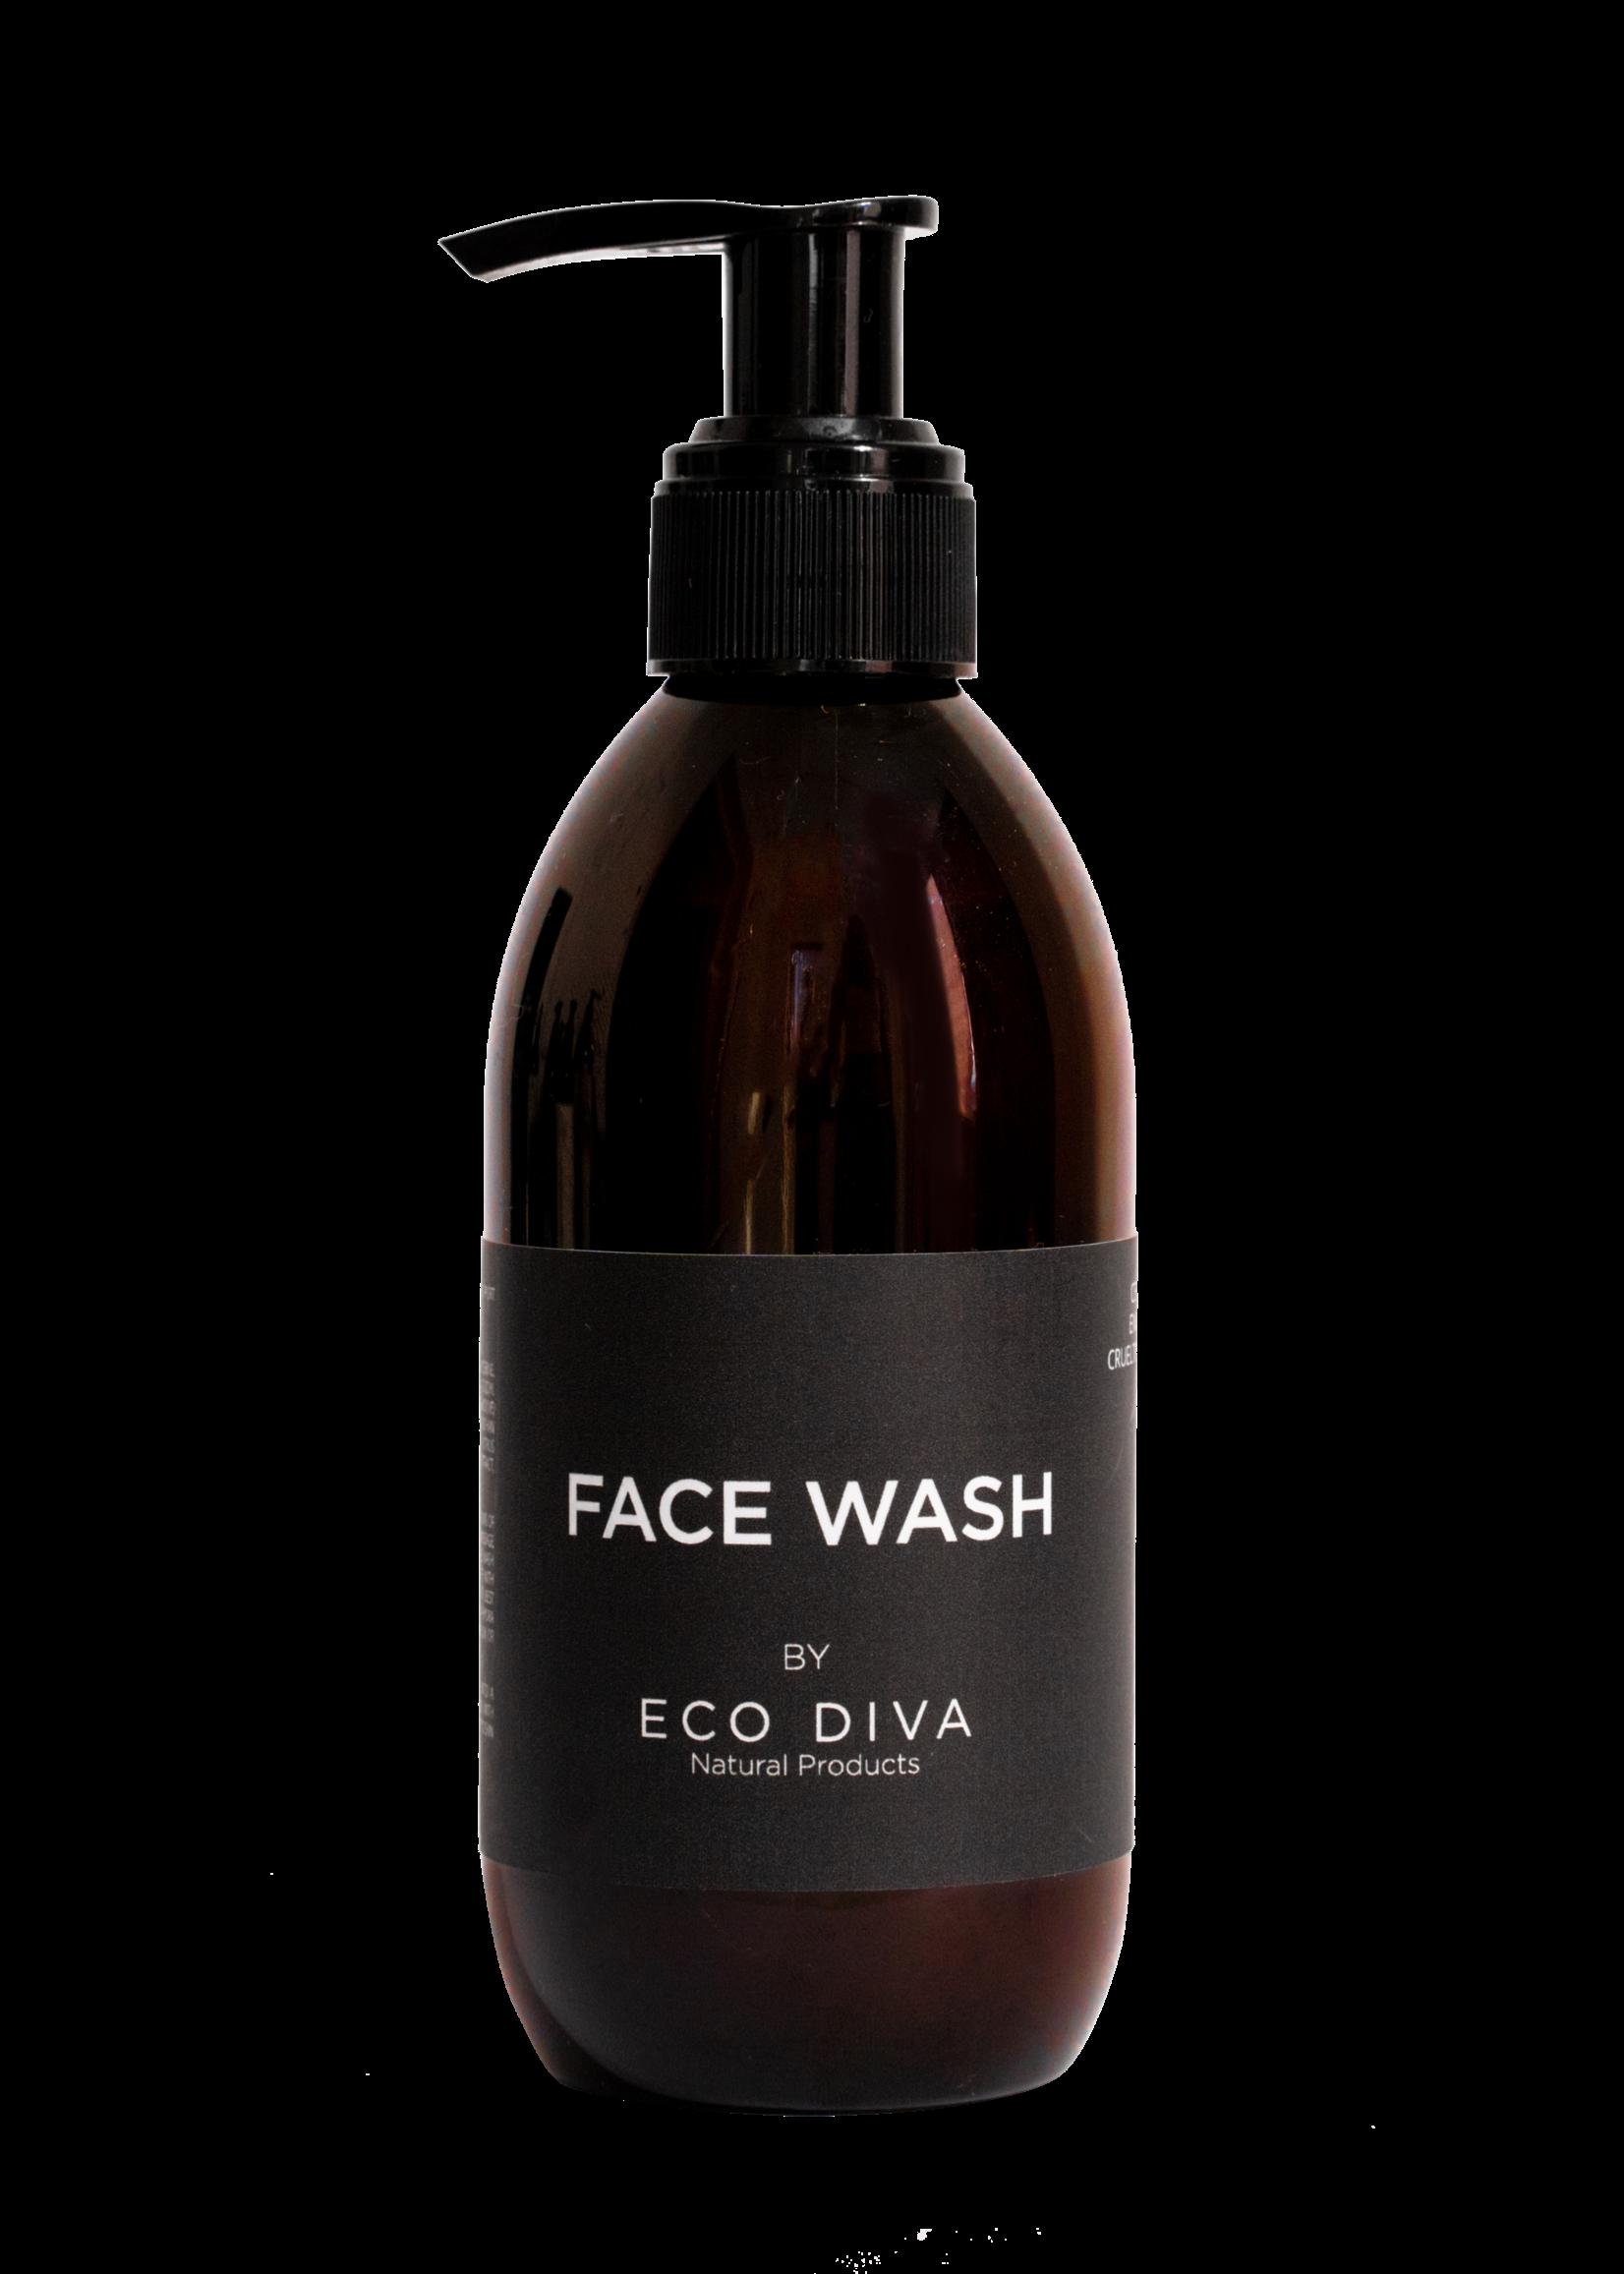 Eco Diva Eco Diva - Face wash 200ml